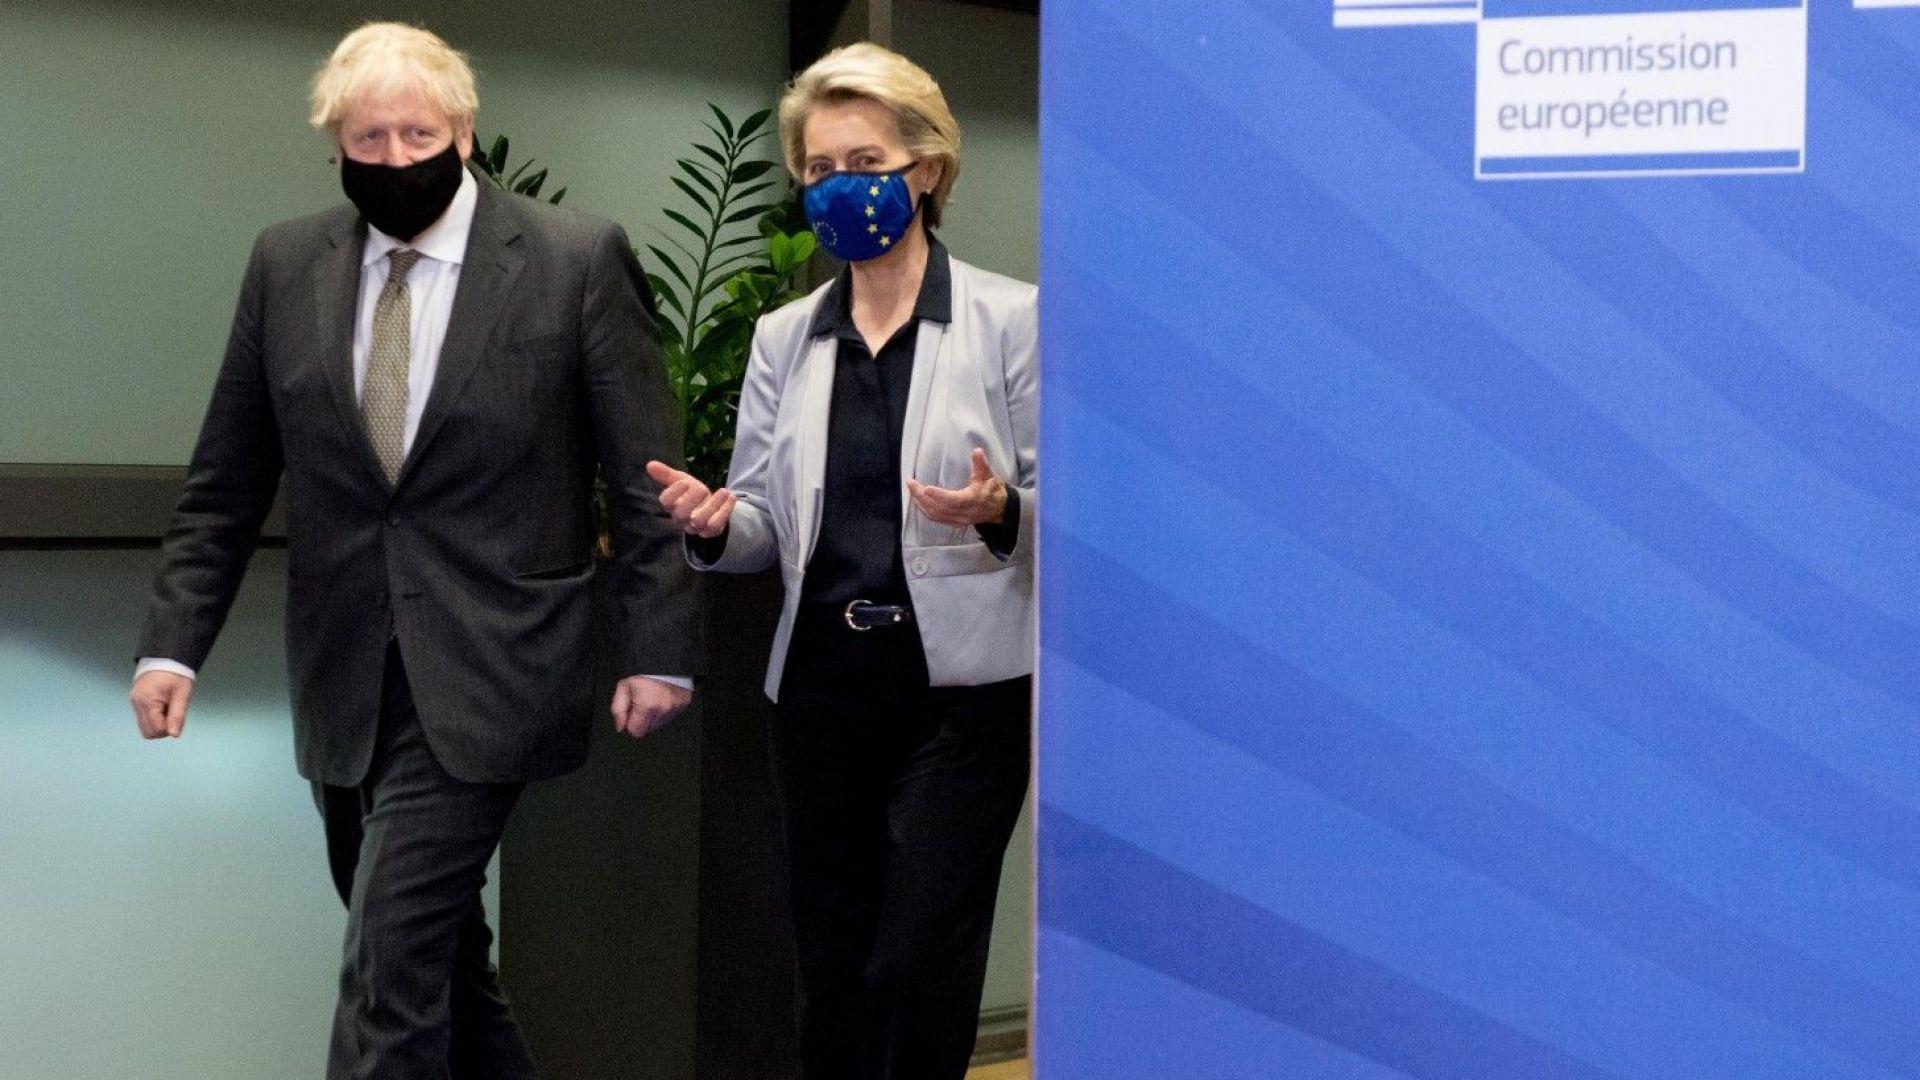 Борис Джонсън и Фон дер Лайен поставиха краен срок за сделка - до края на уикенда